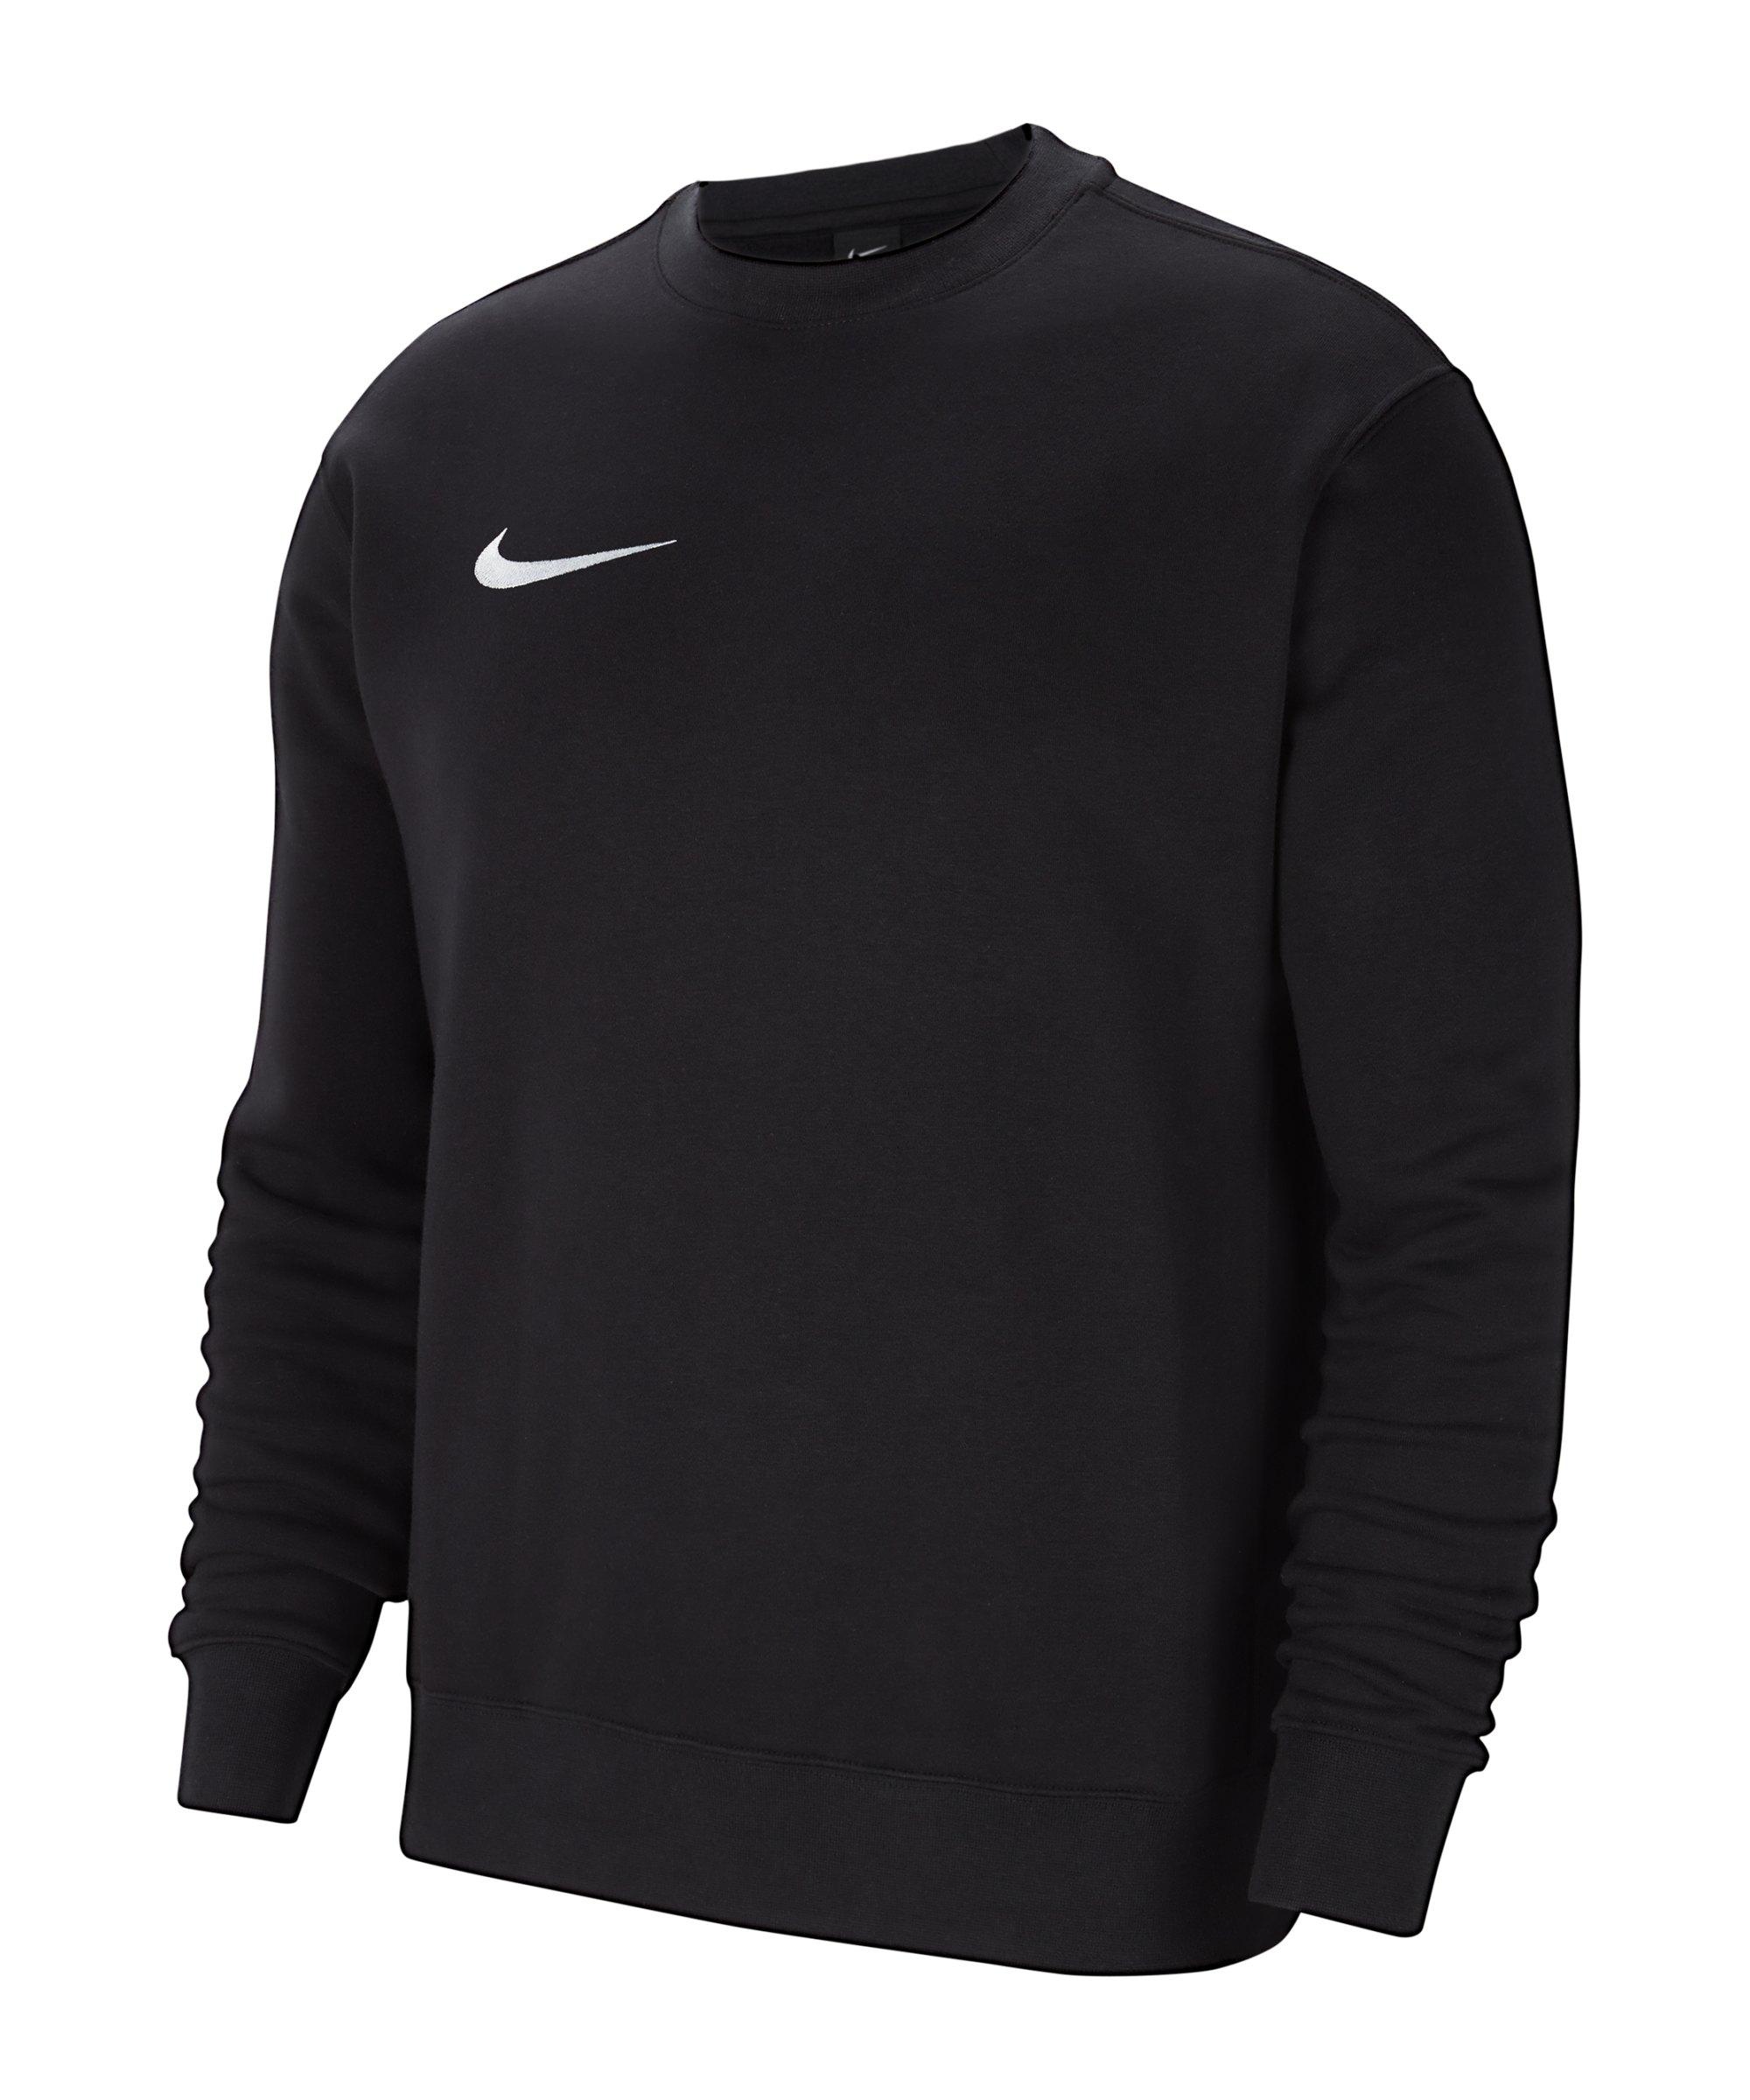 Nike Park 20 Fleece Sweatshirt Kids Schwarz F010 - schwarz